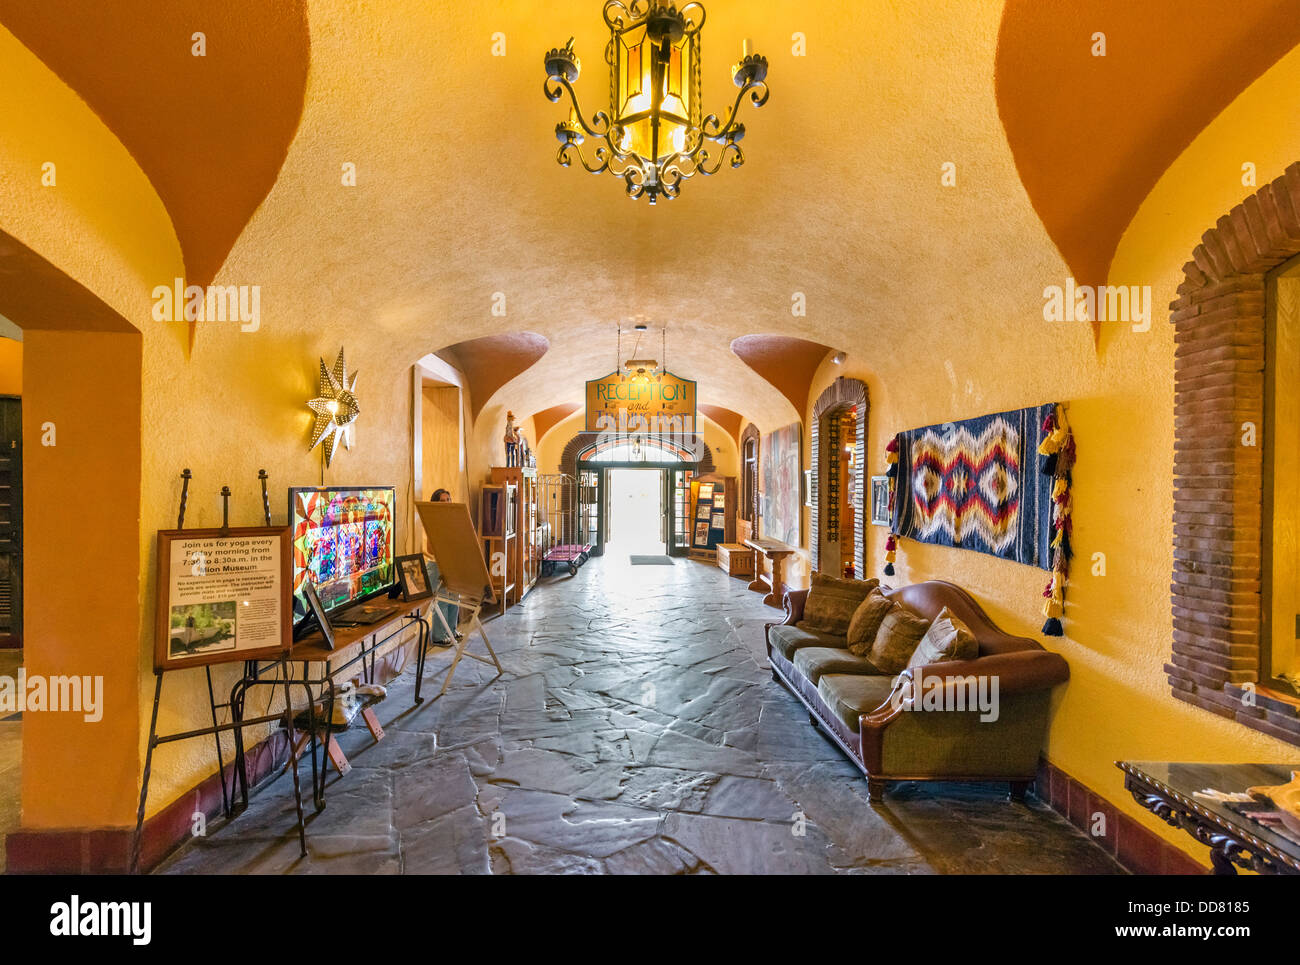 Entrance Hall of the historic La Posada Hotel, Winslow, Arizona, USA - Stock Image